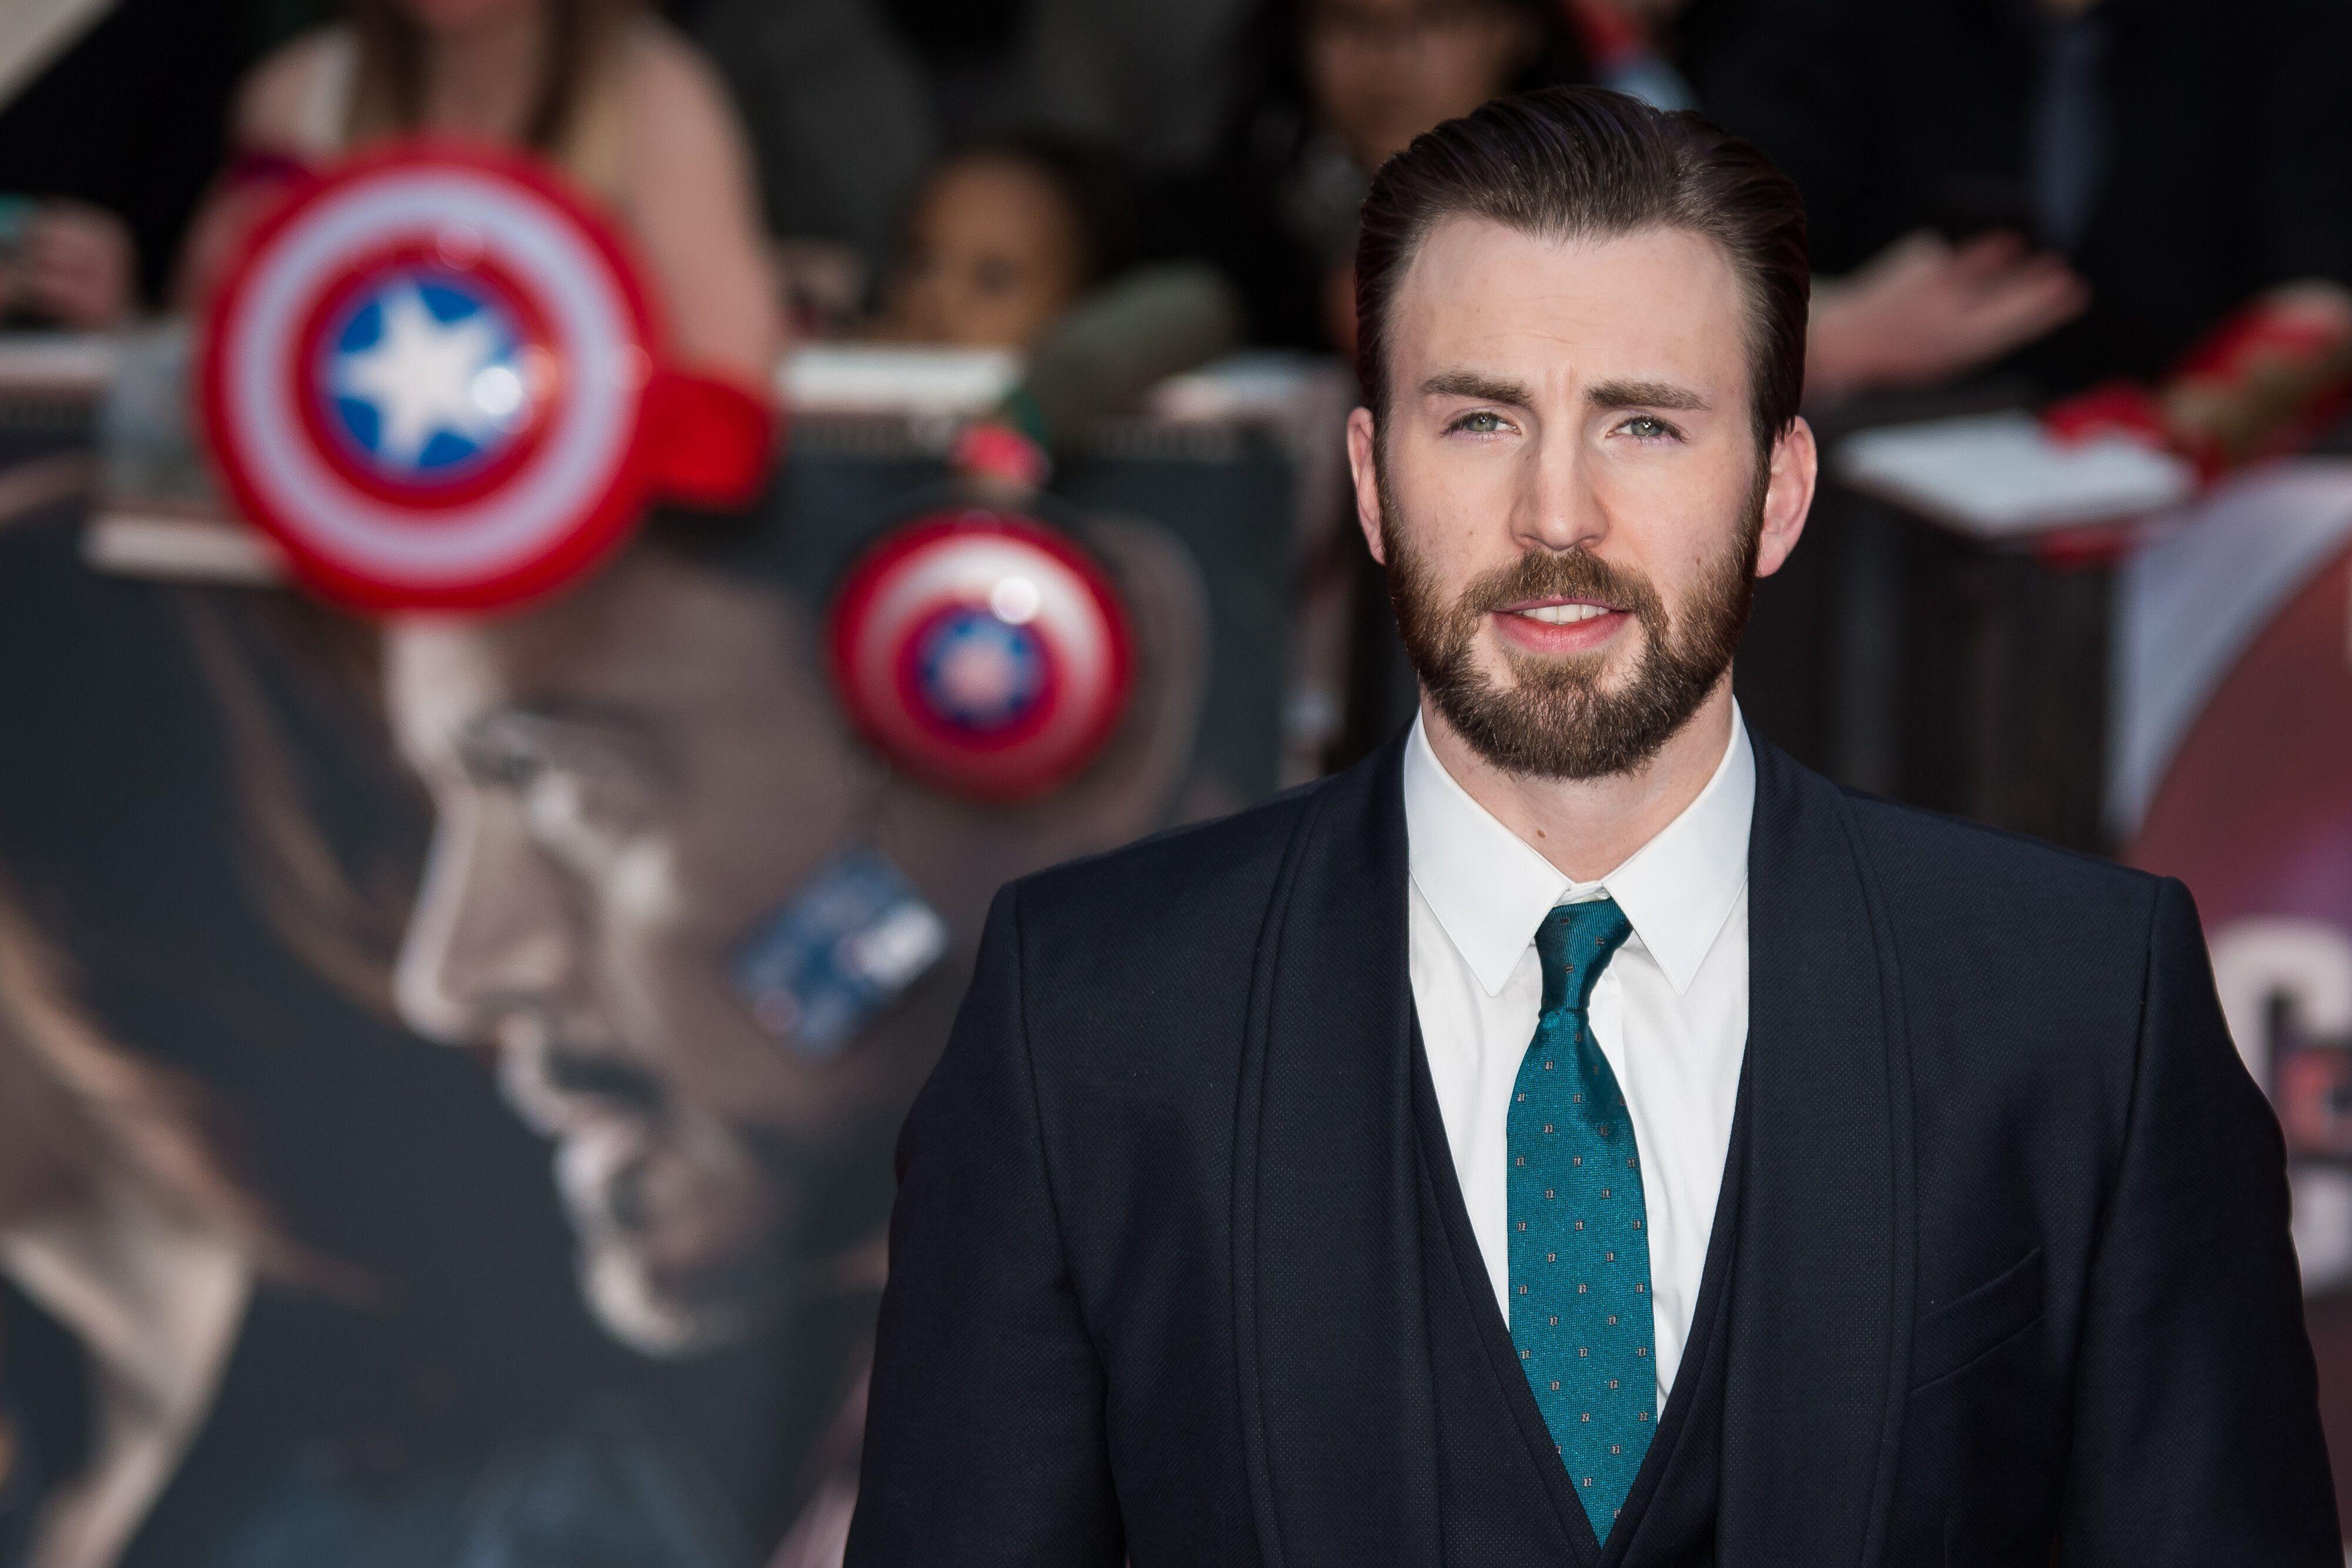 La madre di Chris Evans ha pianto alla fine di Avengers: Endgame thumbnail